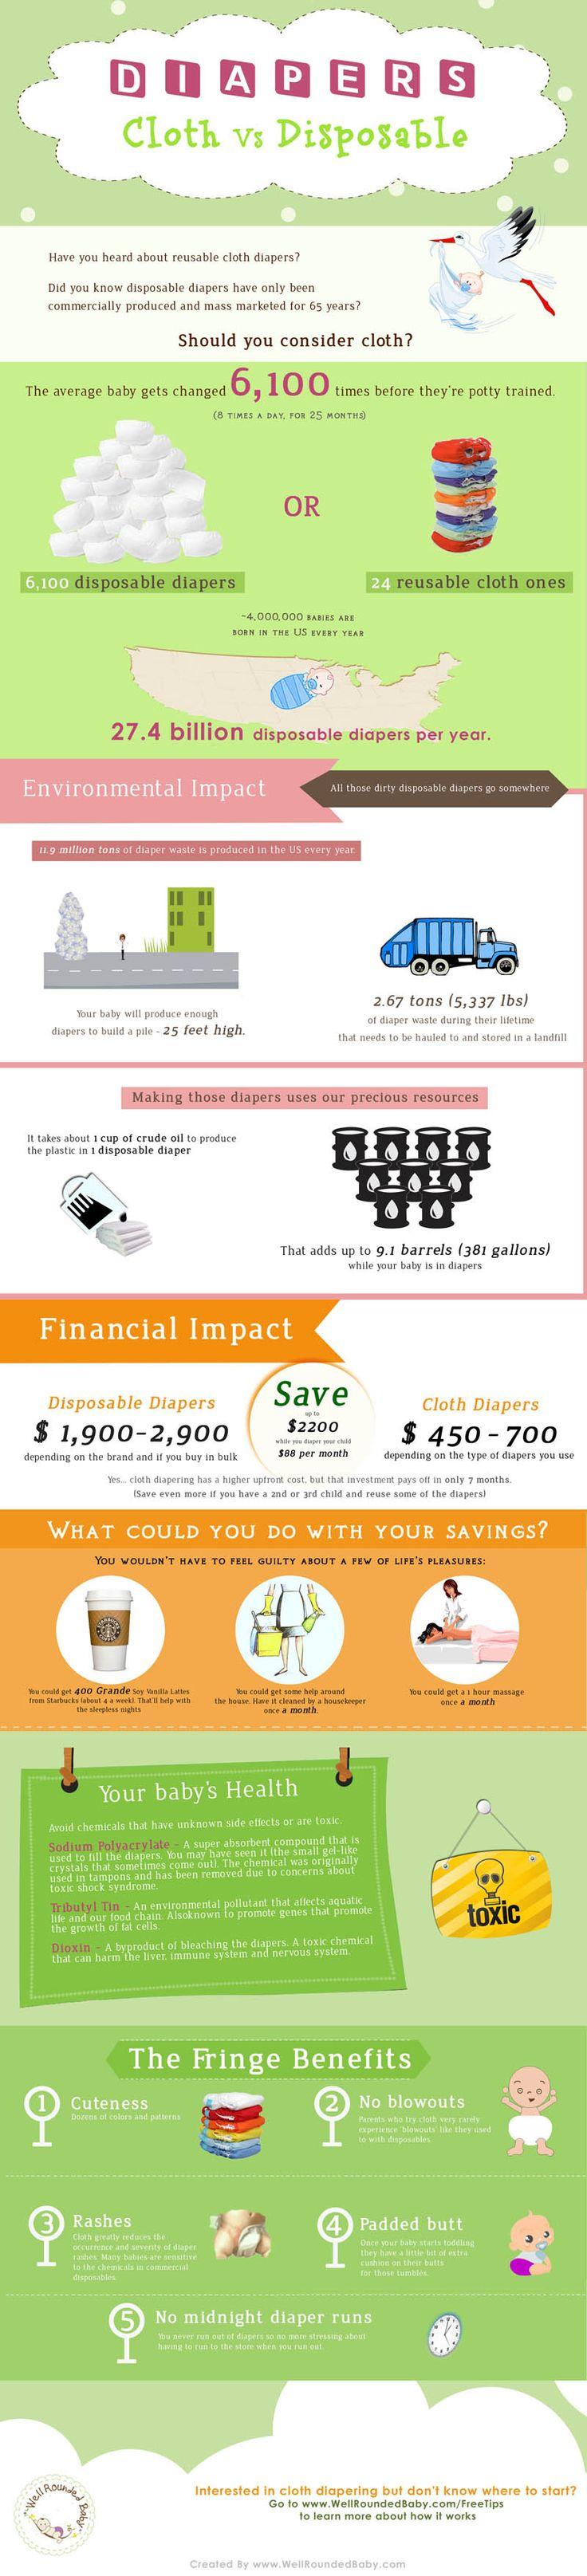 Why Cloth Diapering - An Infographic - Diaper News Portal   Diaper News Portal